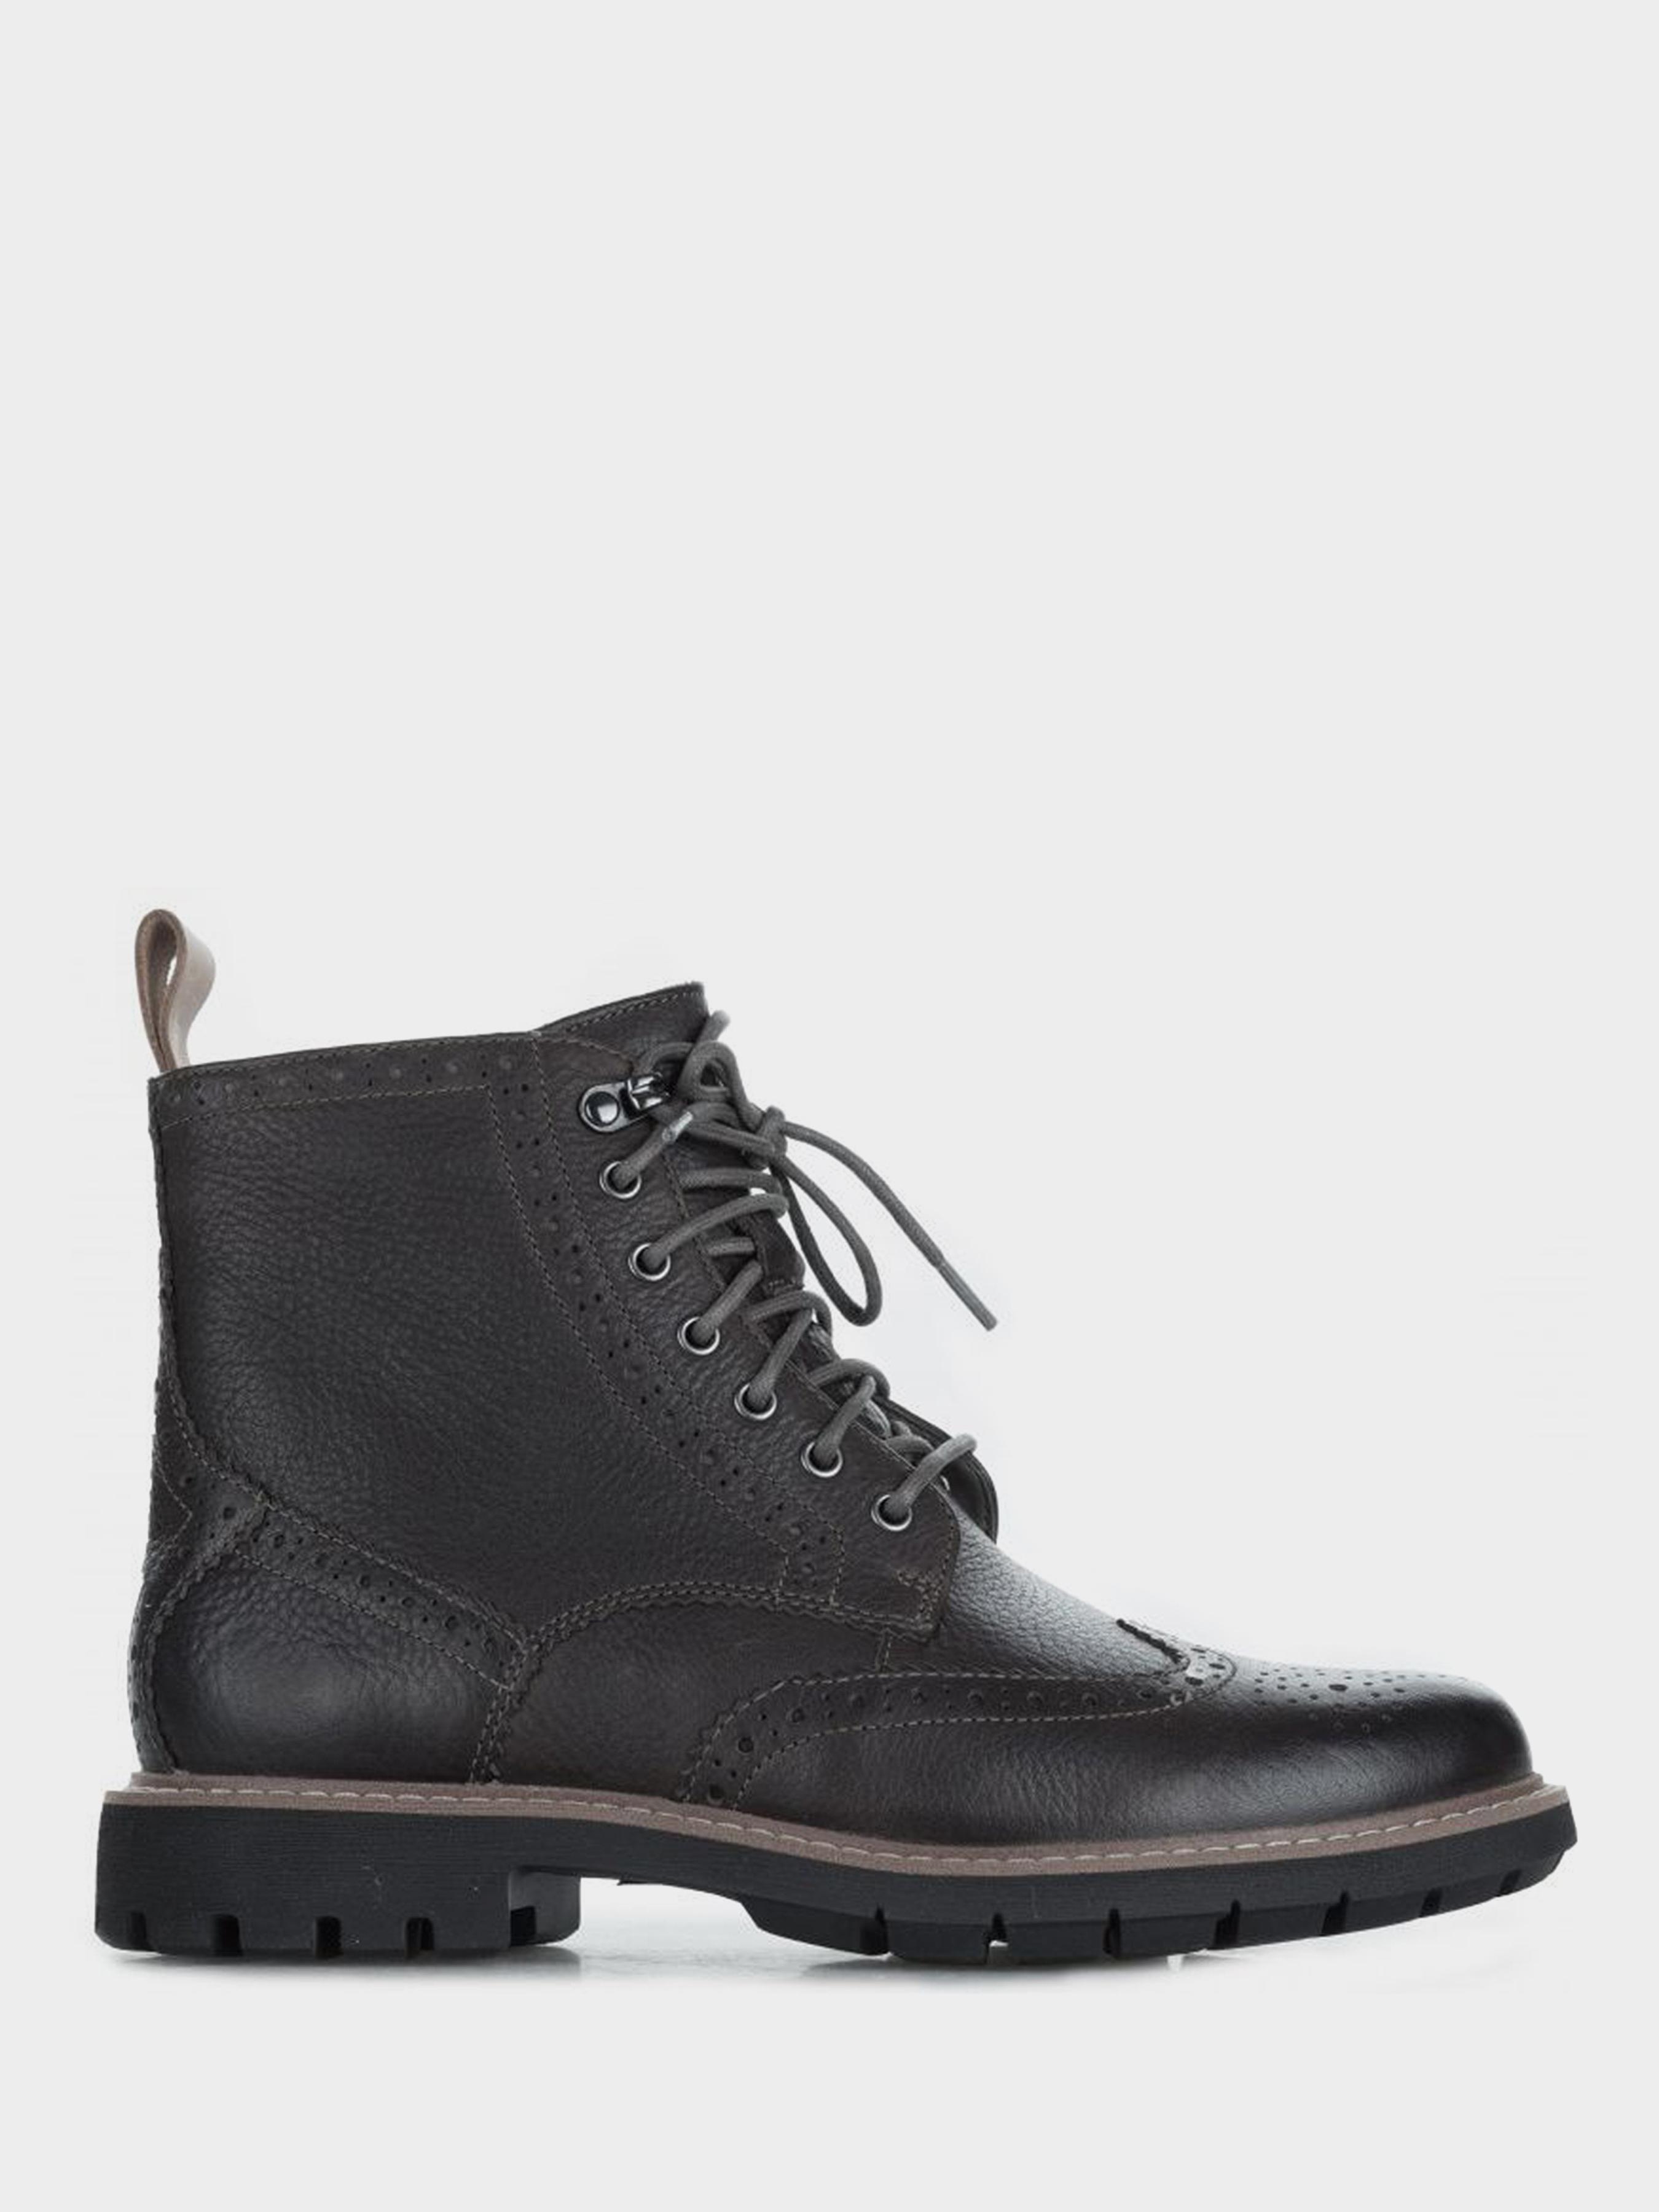 Купить Ботинки мужские Clarks Batcombe Lord OM2907, Серый